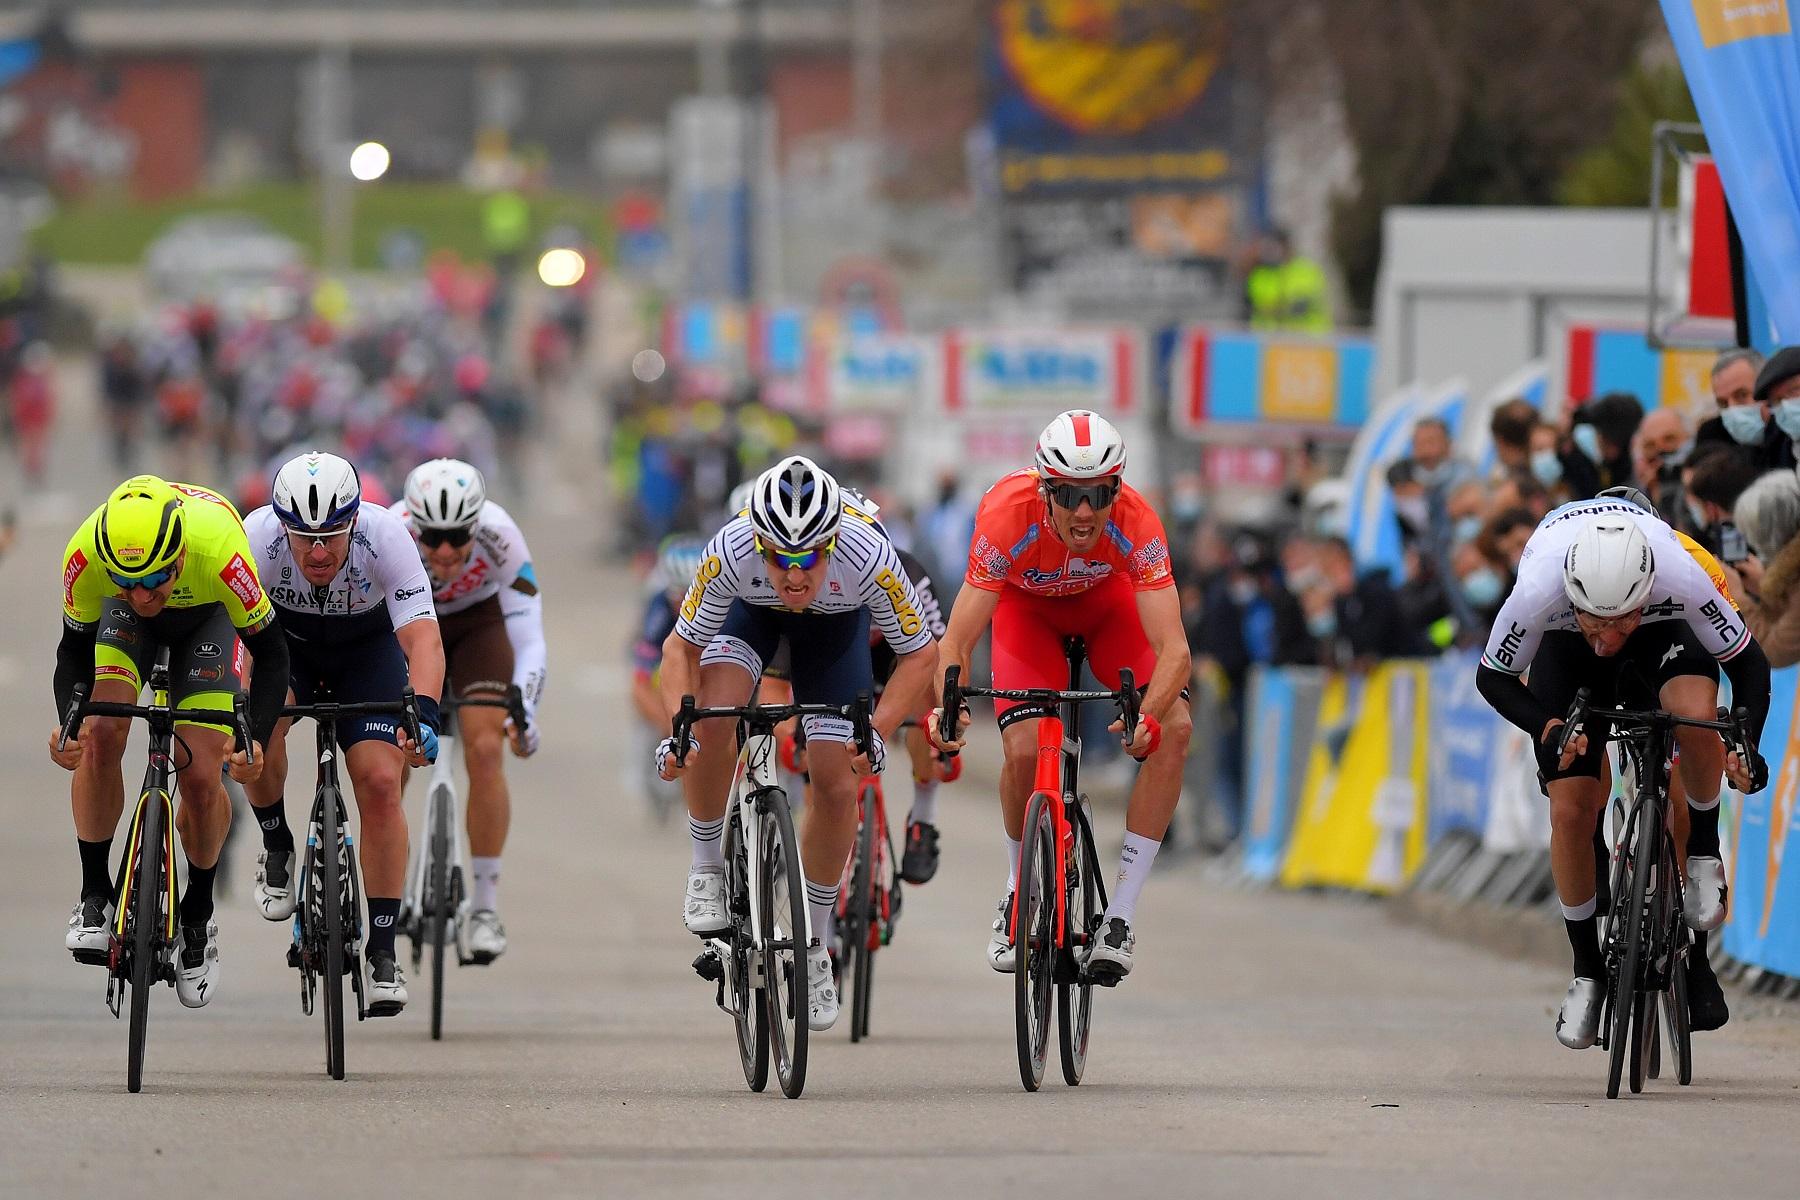 dupont sprint besseges - Crónica de Étoile de Bessèges 2021. Tim Wellens gana y Ganna se luce.